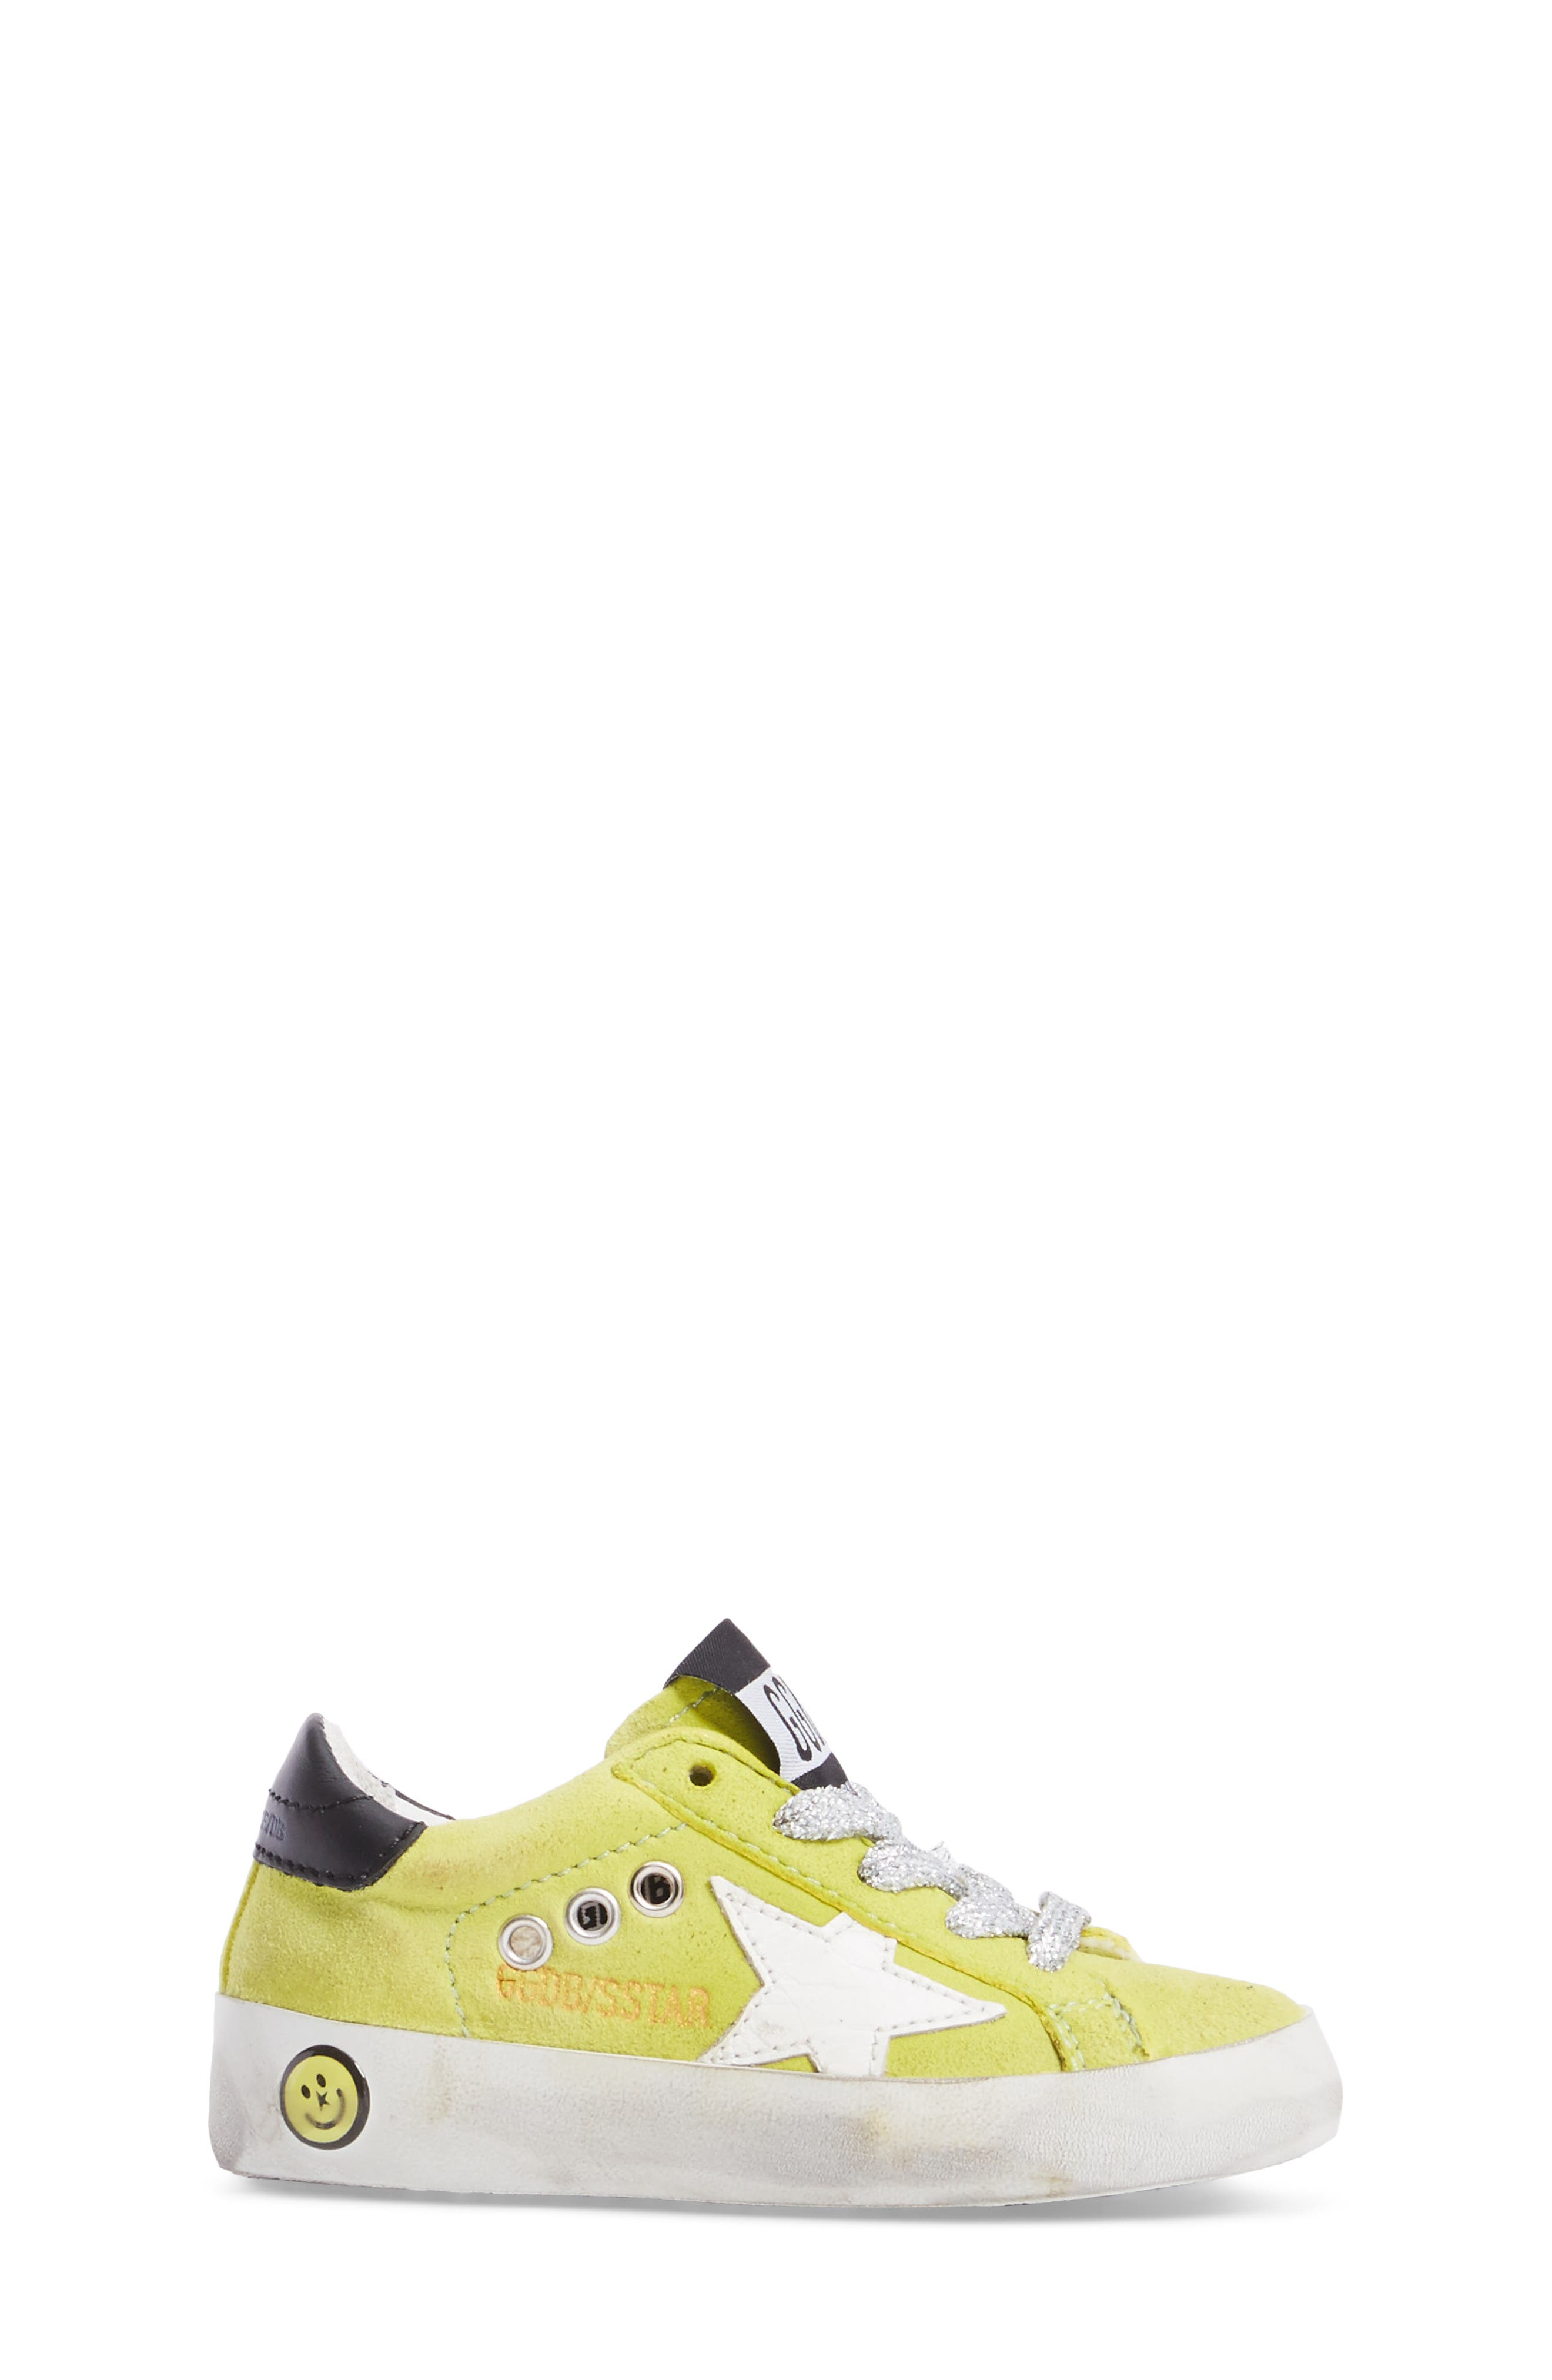 Superstar Low Top Sneaker,                             Alternate thumbnail 3, color,                             300